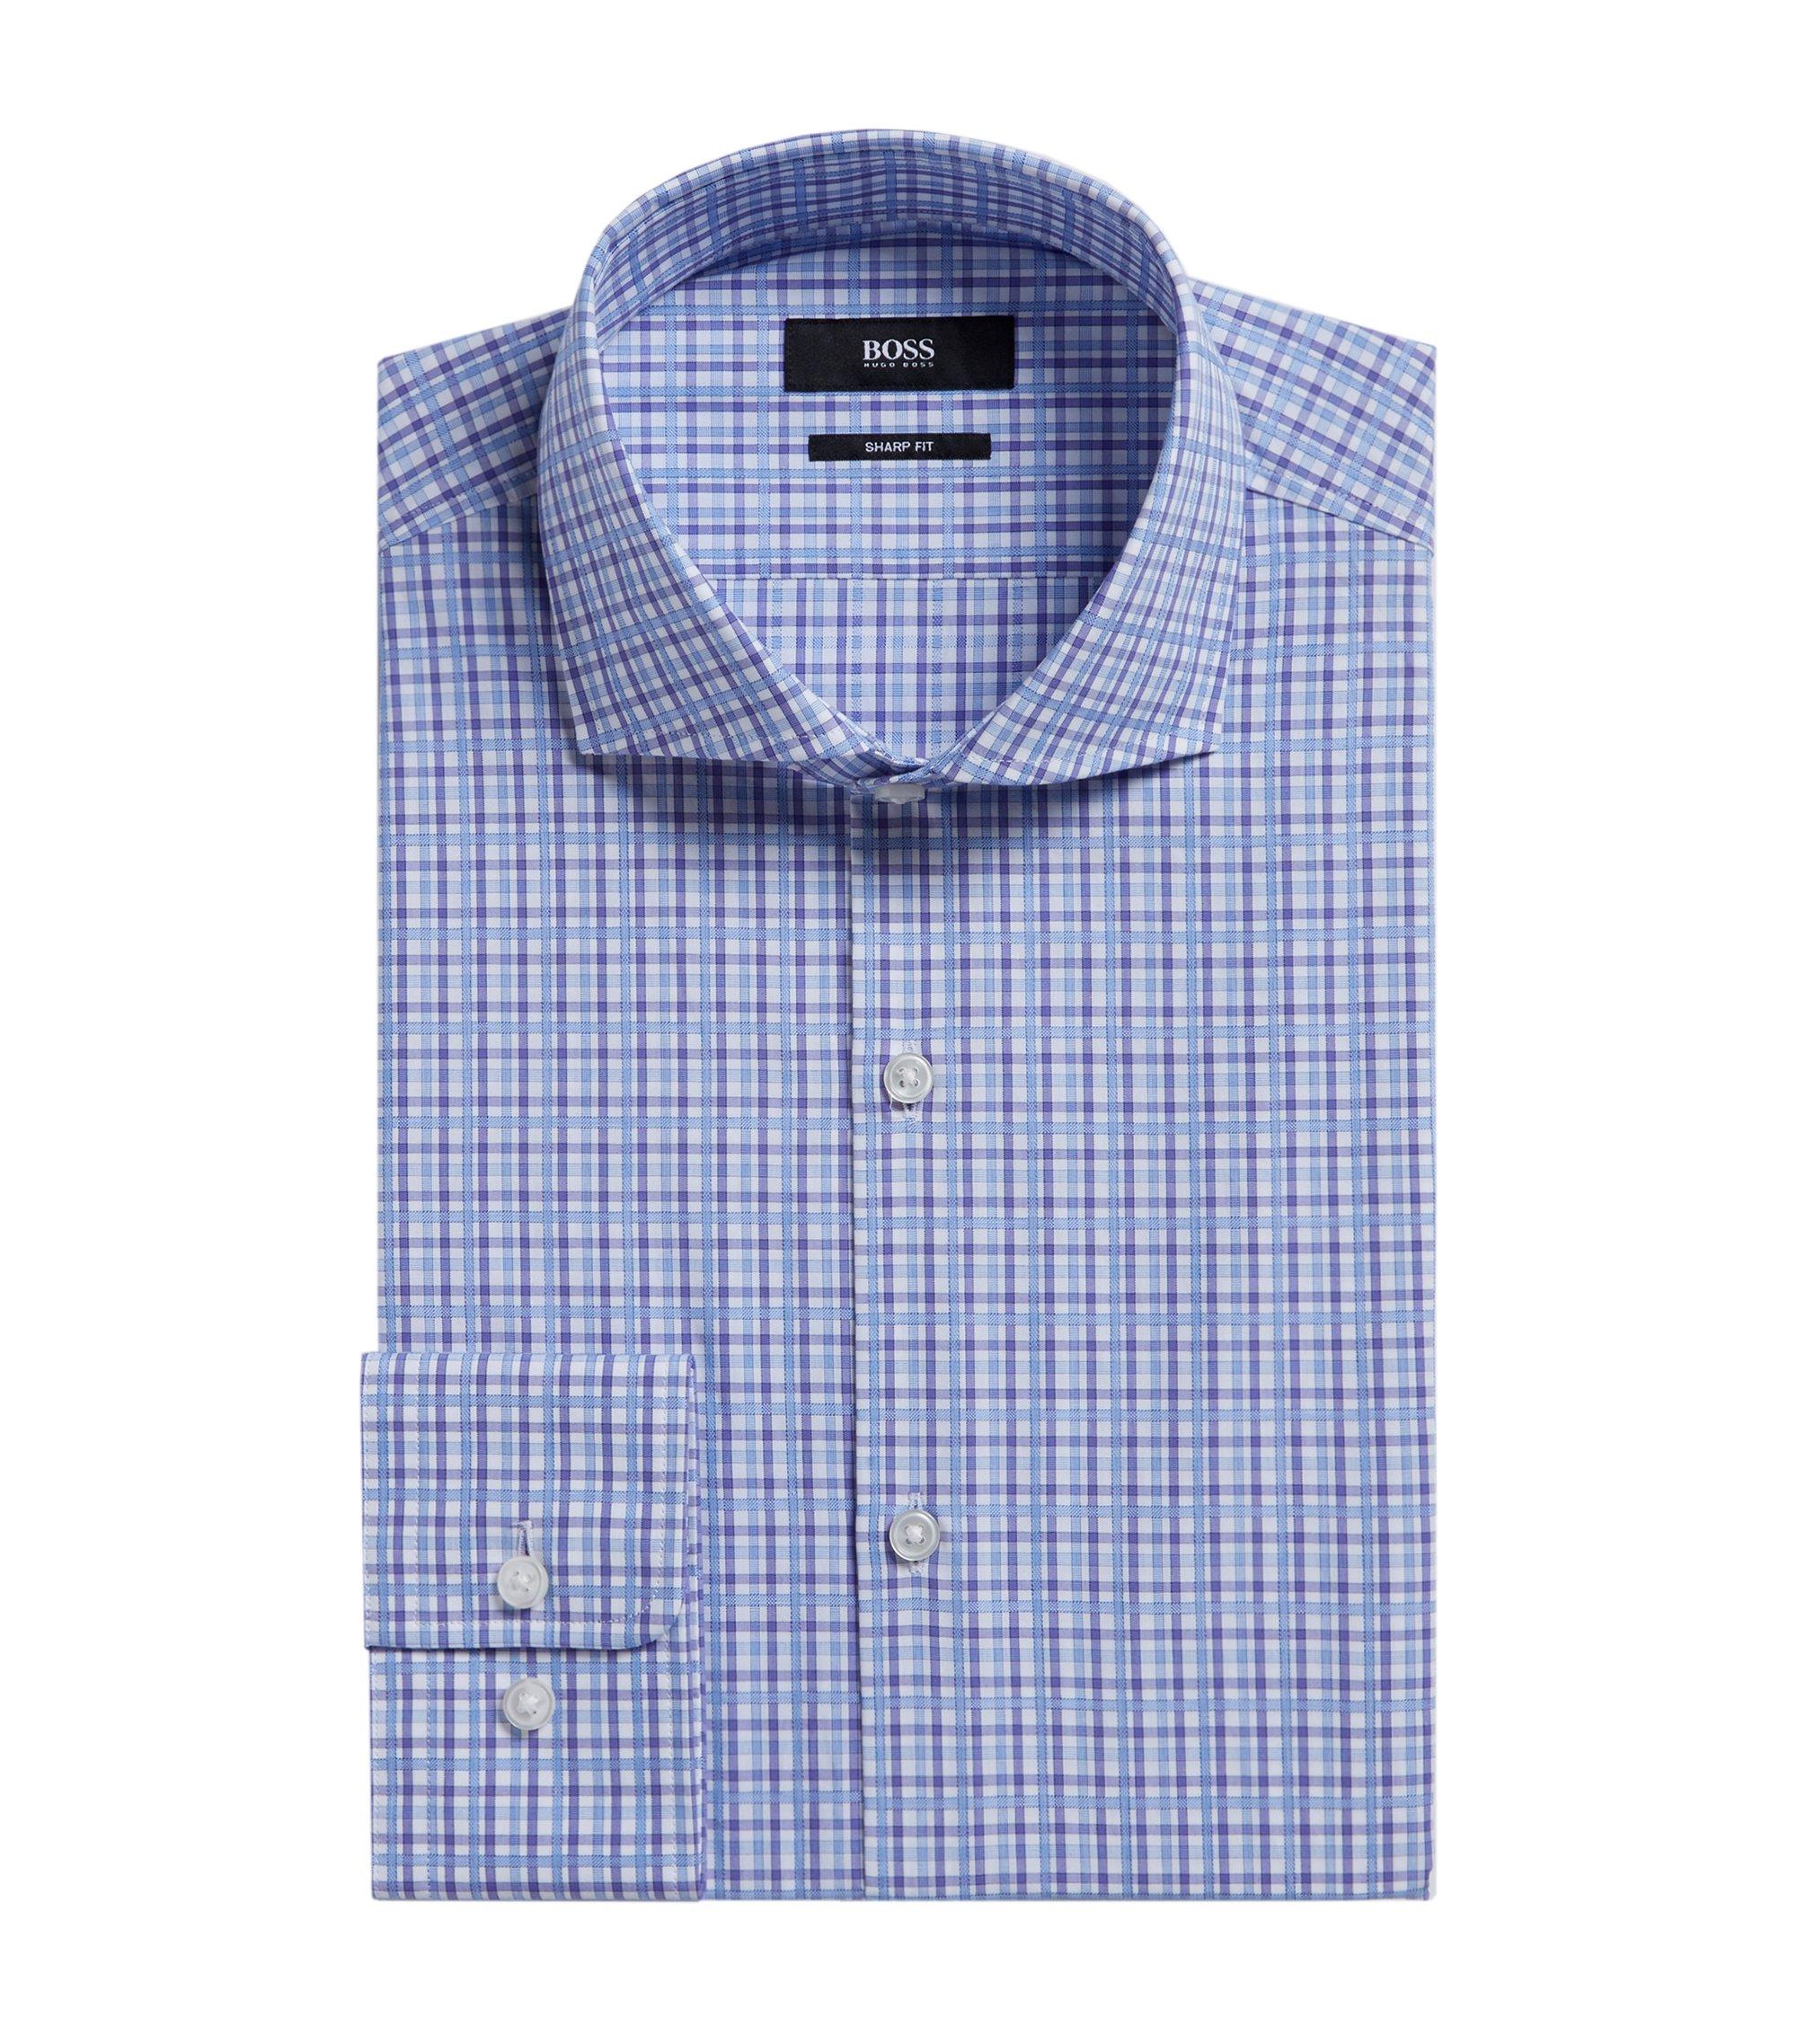 Plaid Cotton Dress Shirt, Sharp Fit   Mark US, Purple